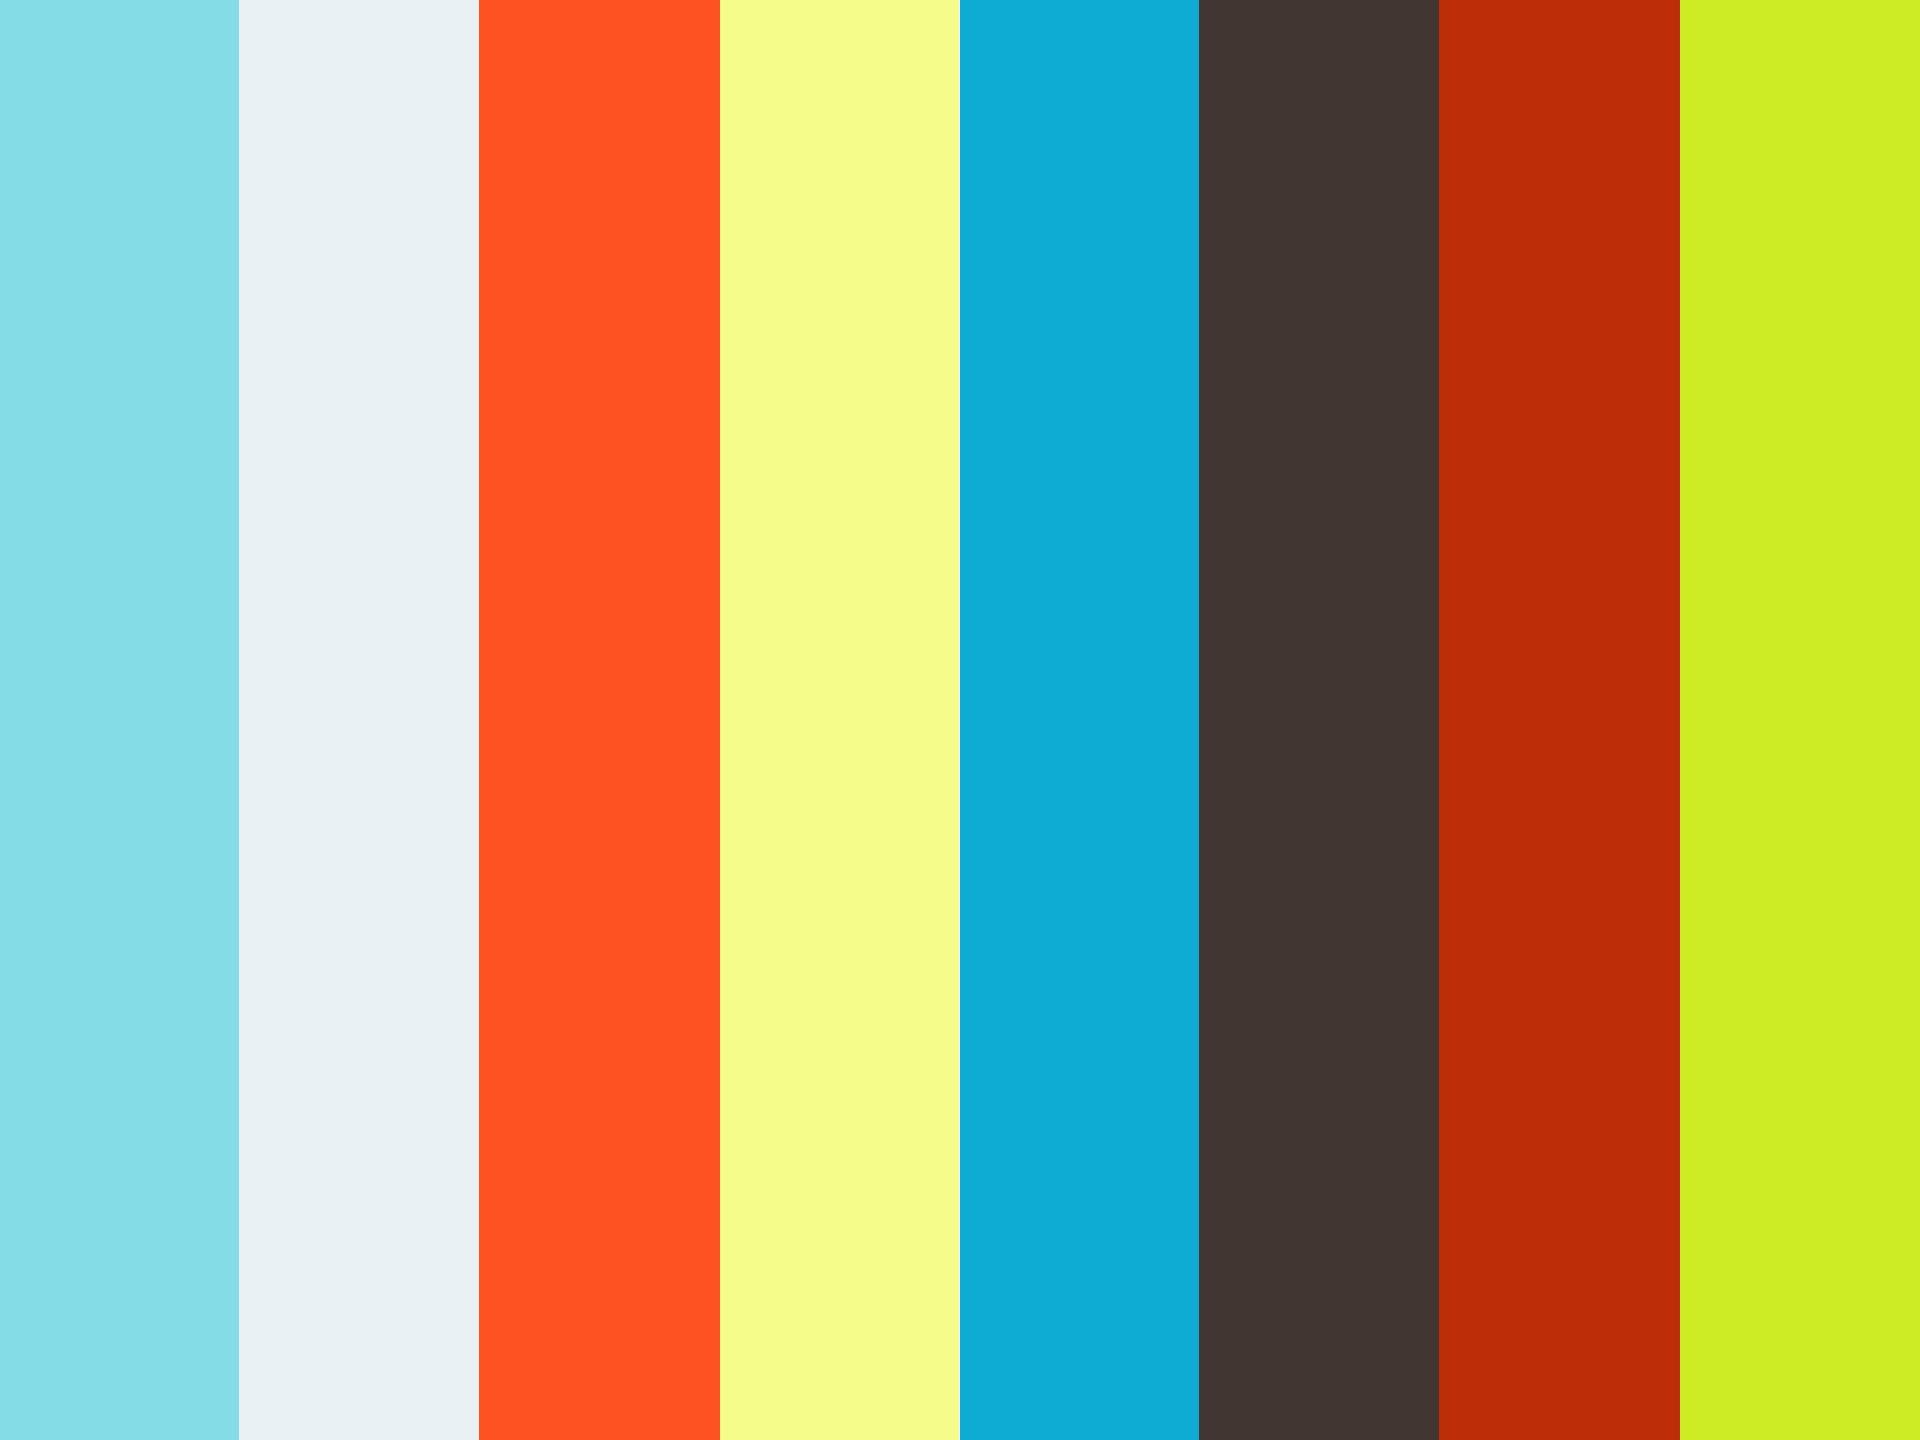 overlay?src0=https%3A%2F%2Fi.vimeocdn.com%2Fvideo%2F571439229_1280x720&src1=https%3A%2F%2Ff.vimeocdn.com%2Fimages_v6%2Fshare%2Fplay_icon_overlay kichler tape light installation on vimeo